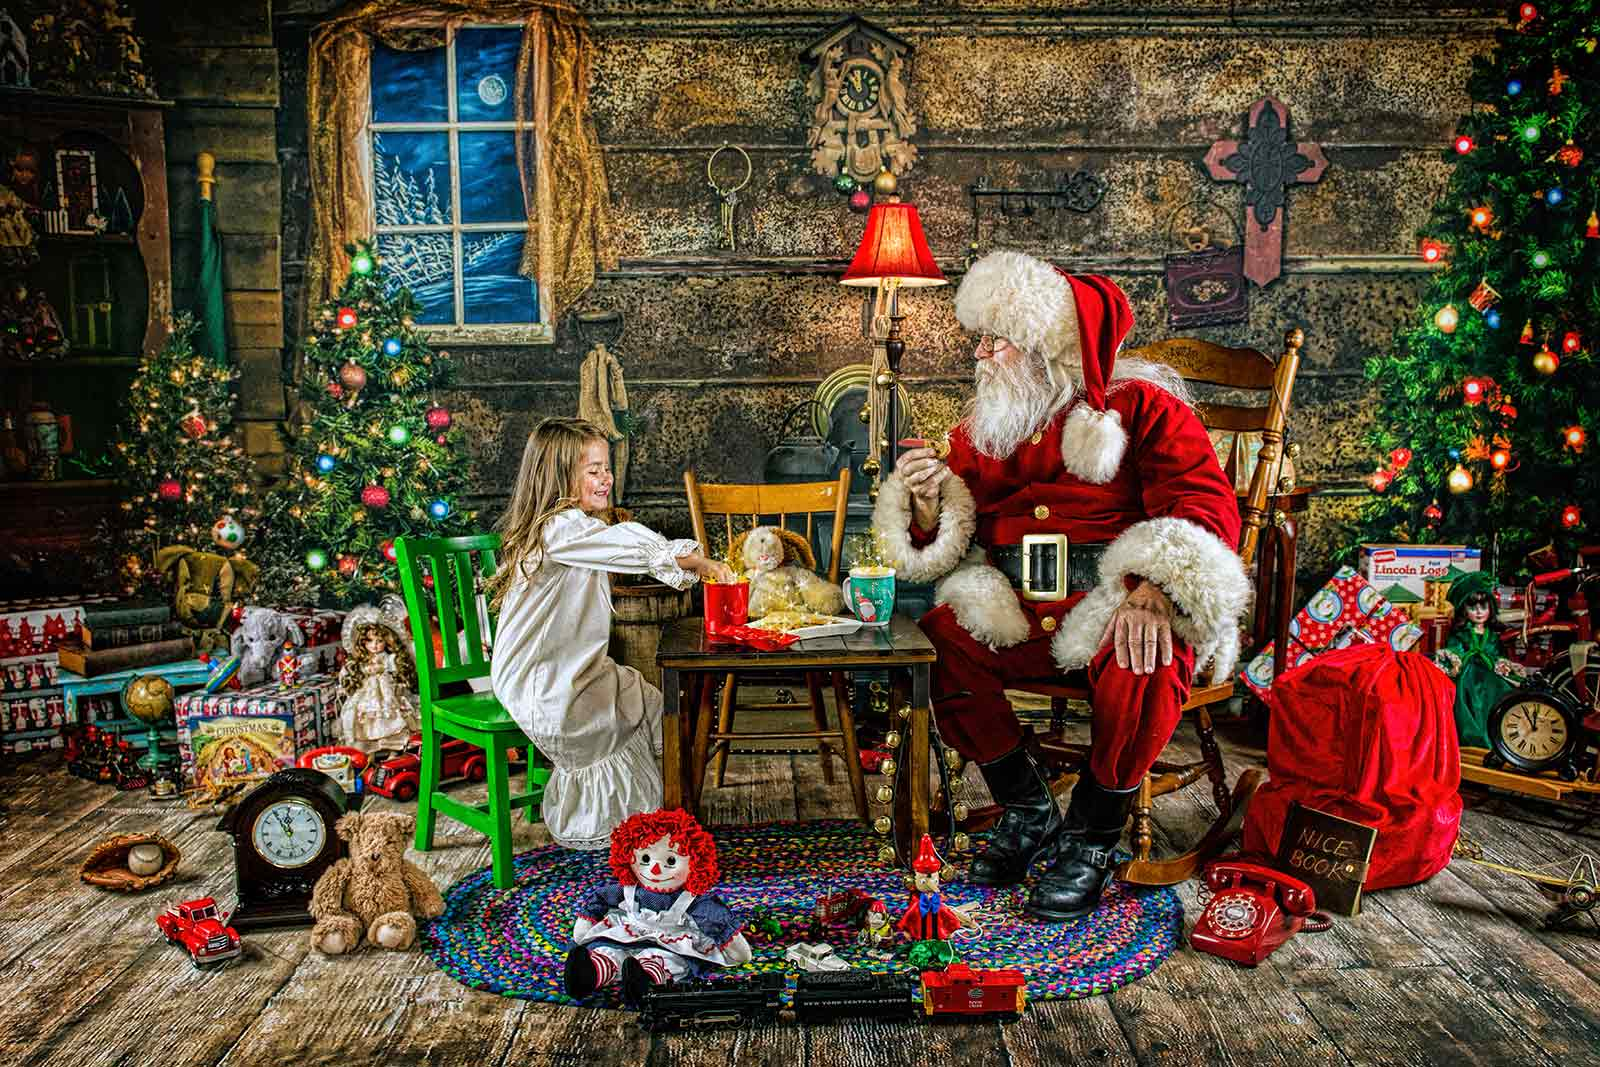 020_Magic-of-Santa-Anna-Thielen-Photography